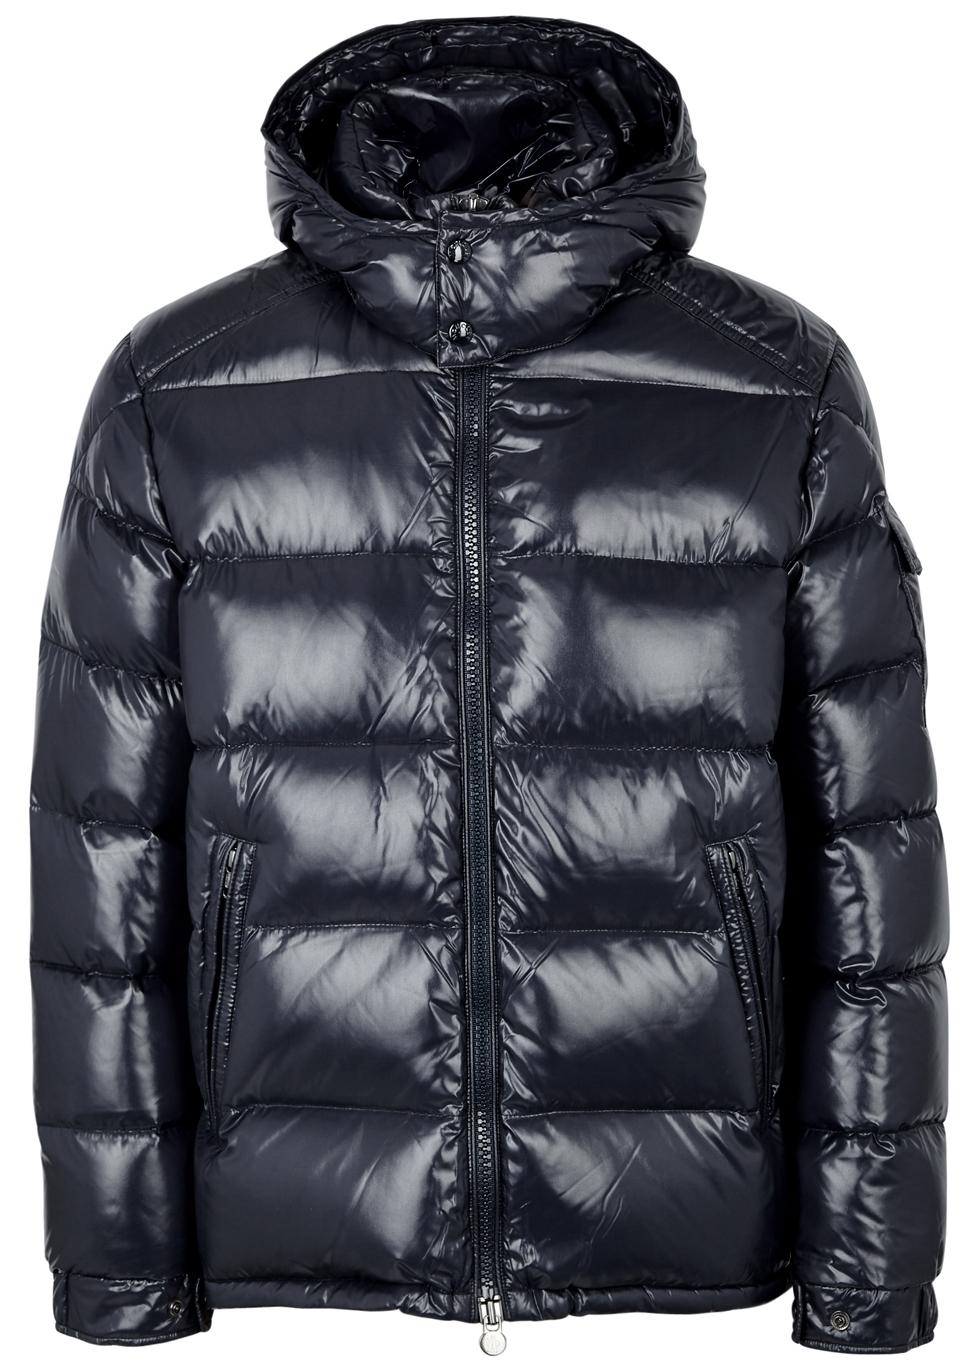 Maya navy quilted shell jacket - Moncler